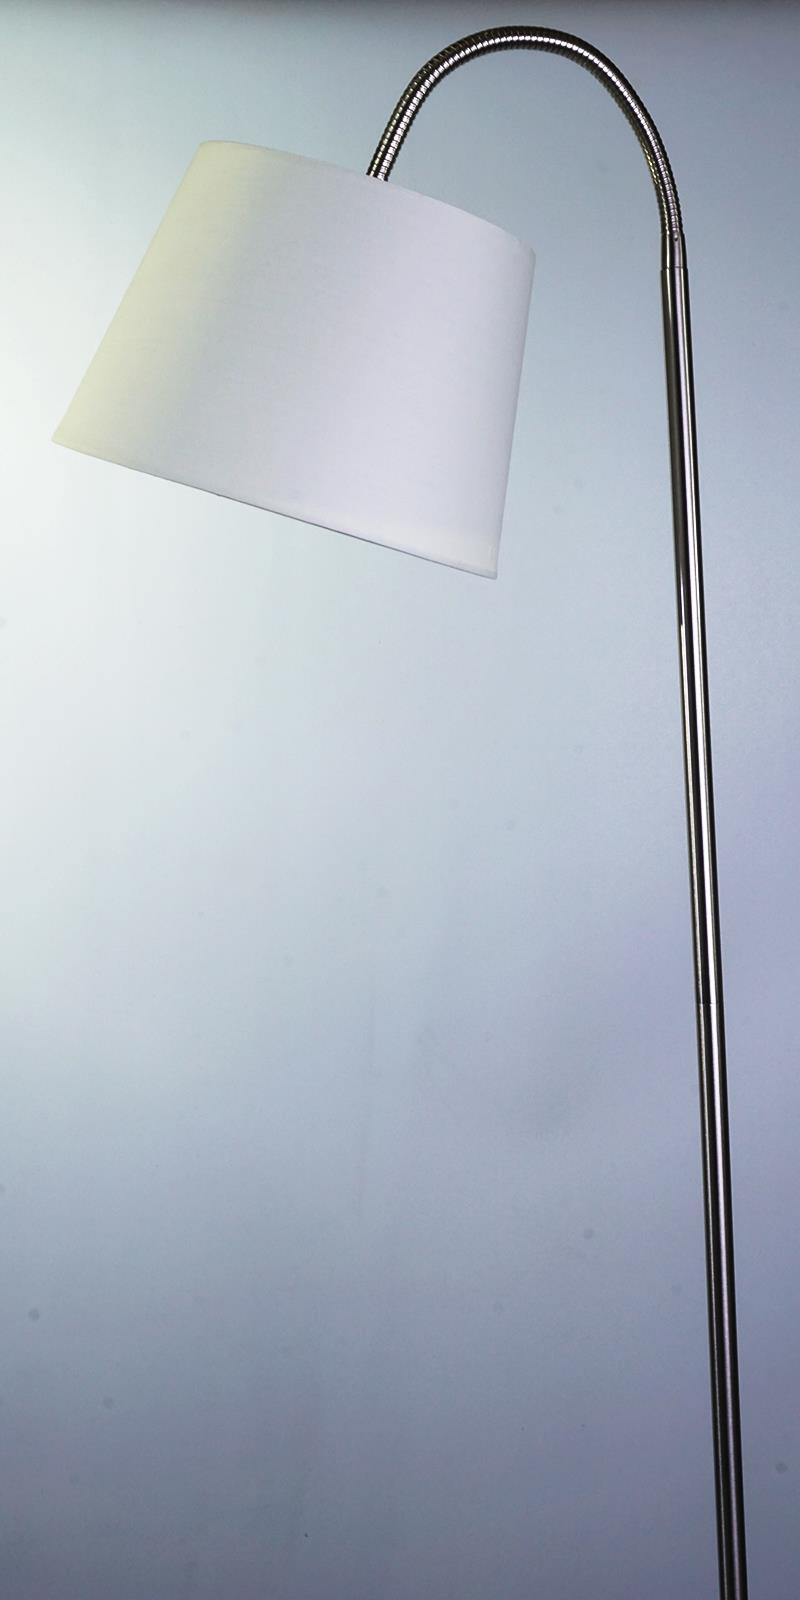 LED-STEHLEUCHTE CREME gebogen Leuchte Lampe EAN209 Livarno Lux - EUR ...